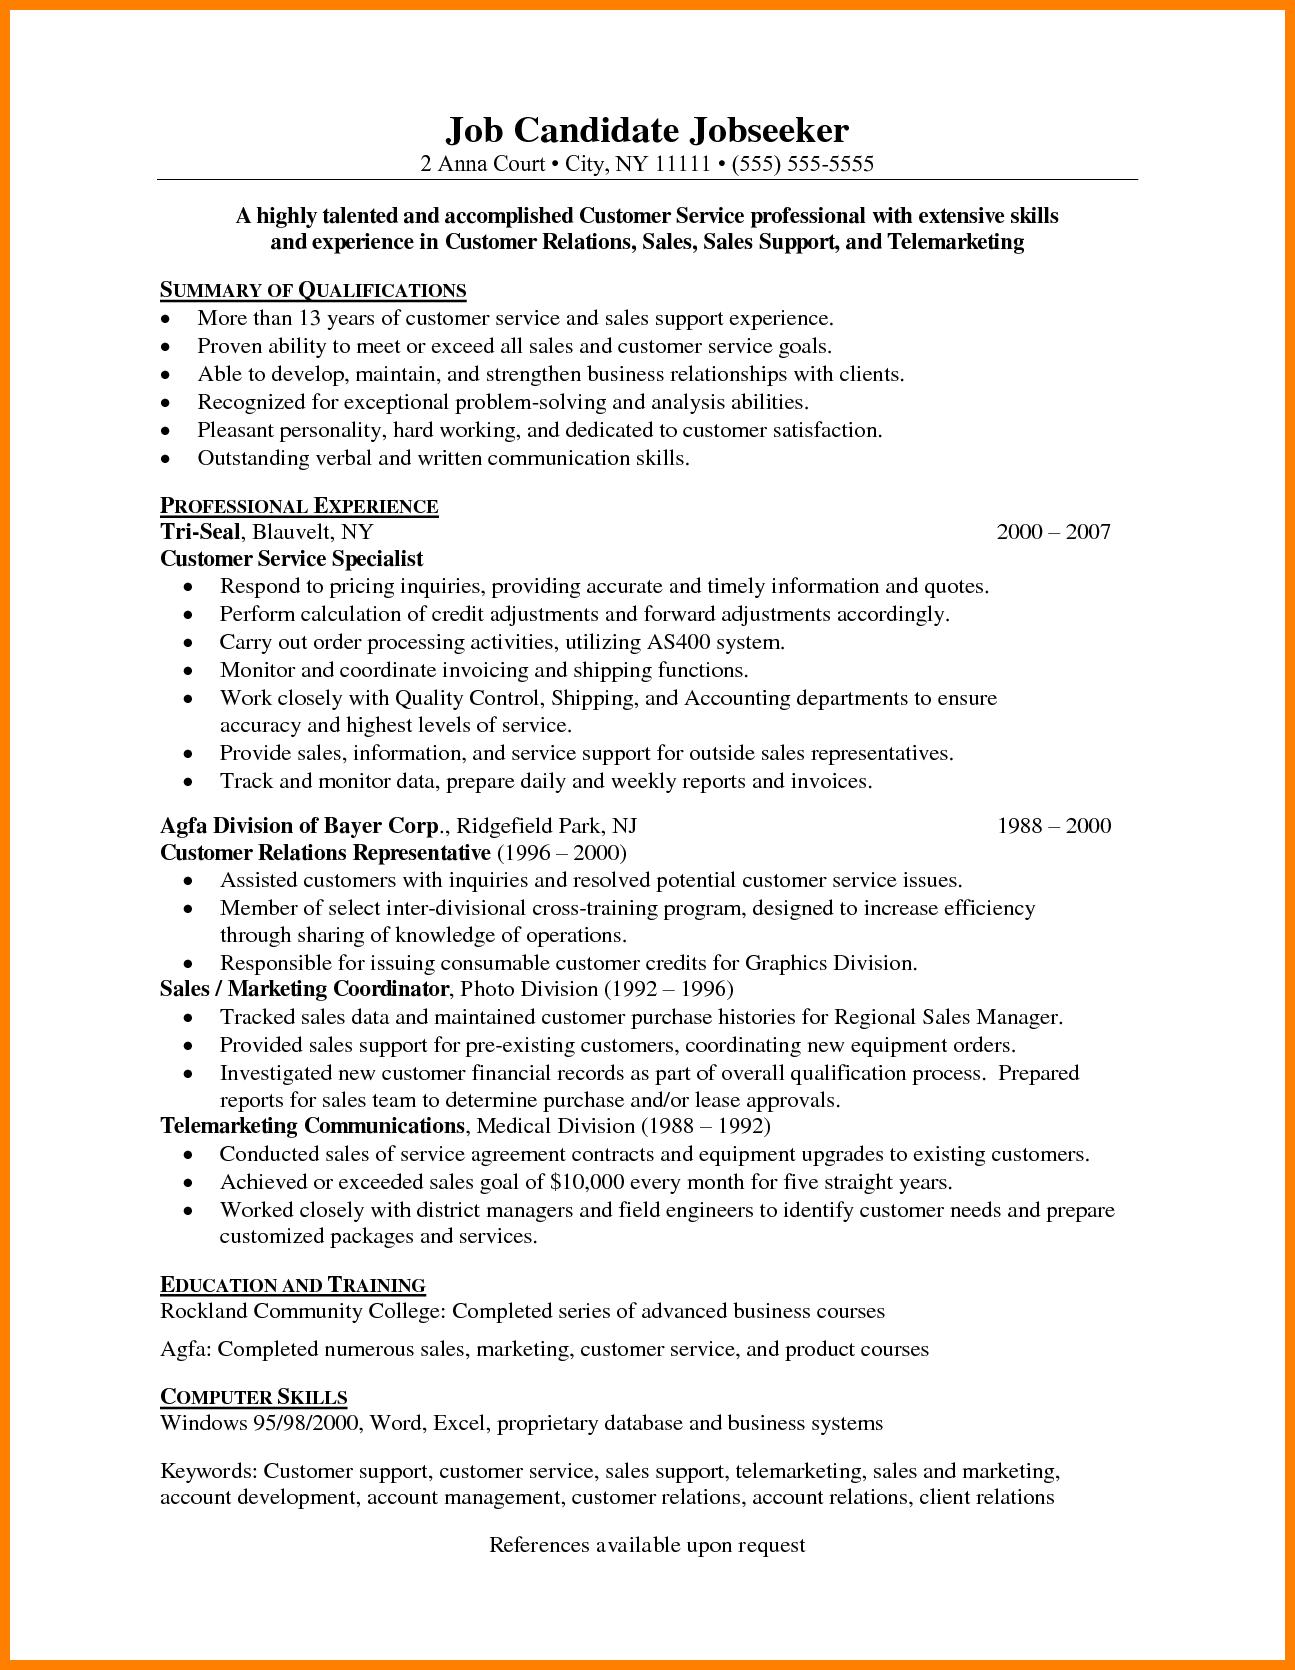 resume Resume Telemarketing url resume htm telemarketing the best estimate professional professional